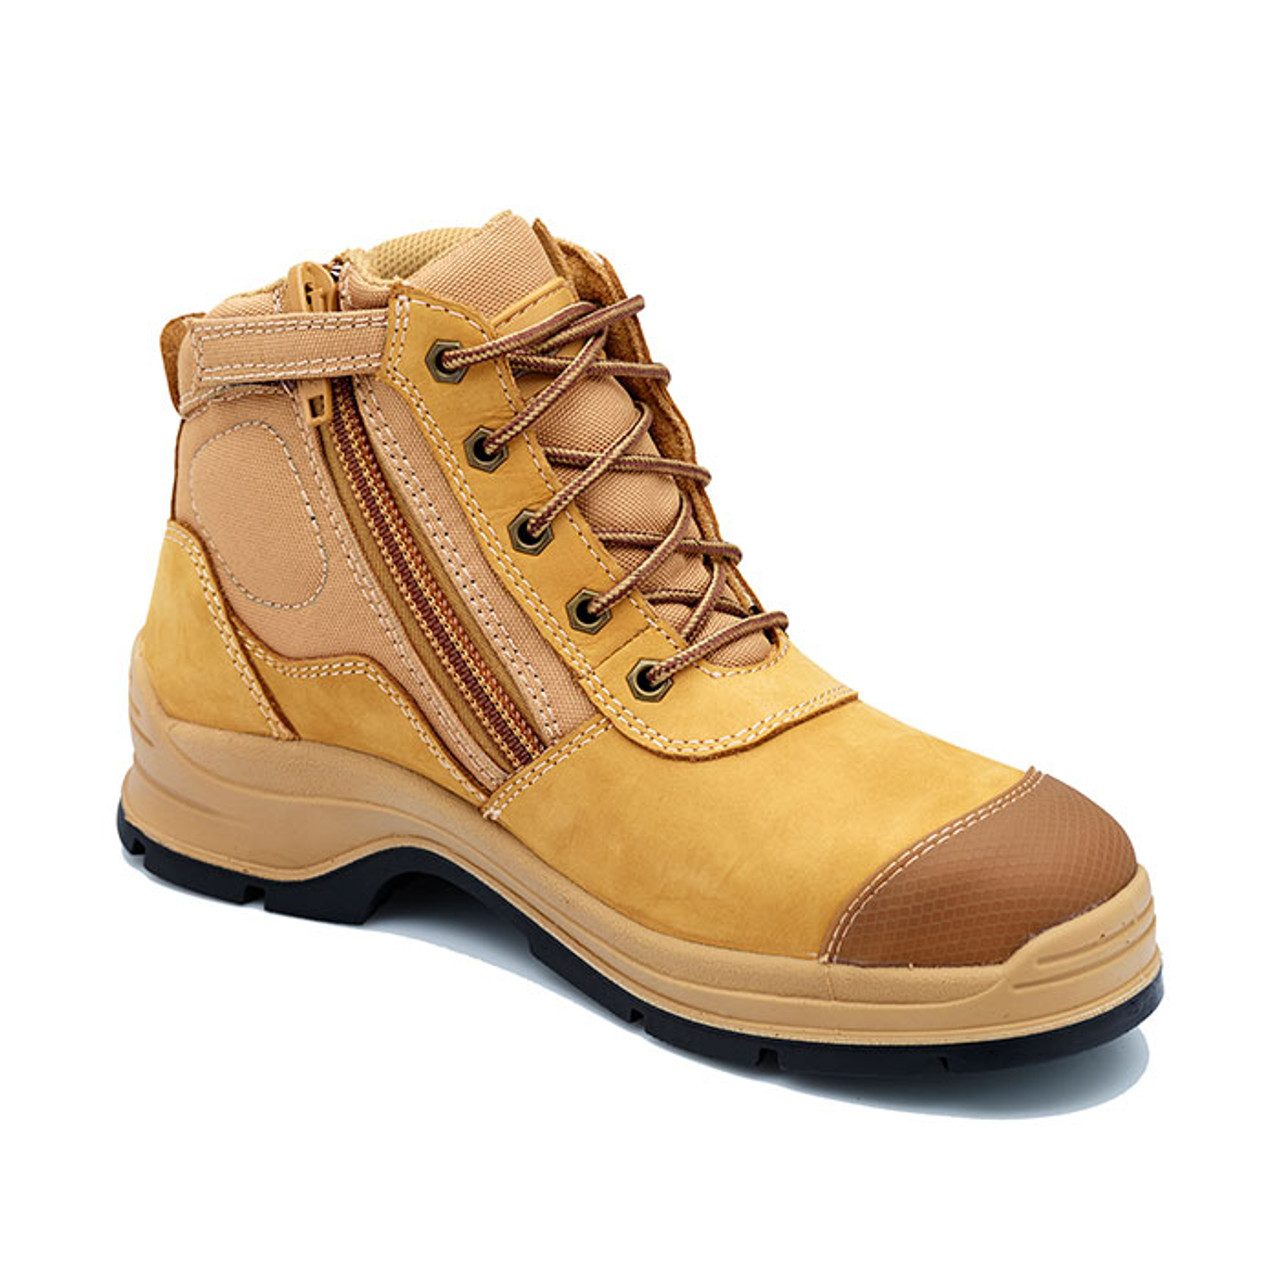 7a9795dddeb Blundstone 318 Steel Cap Hiking Style Work Boots in Wheat Nubuk ...